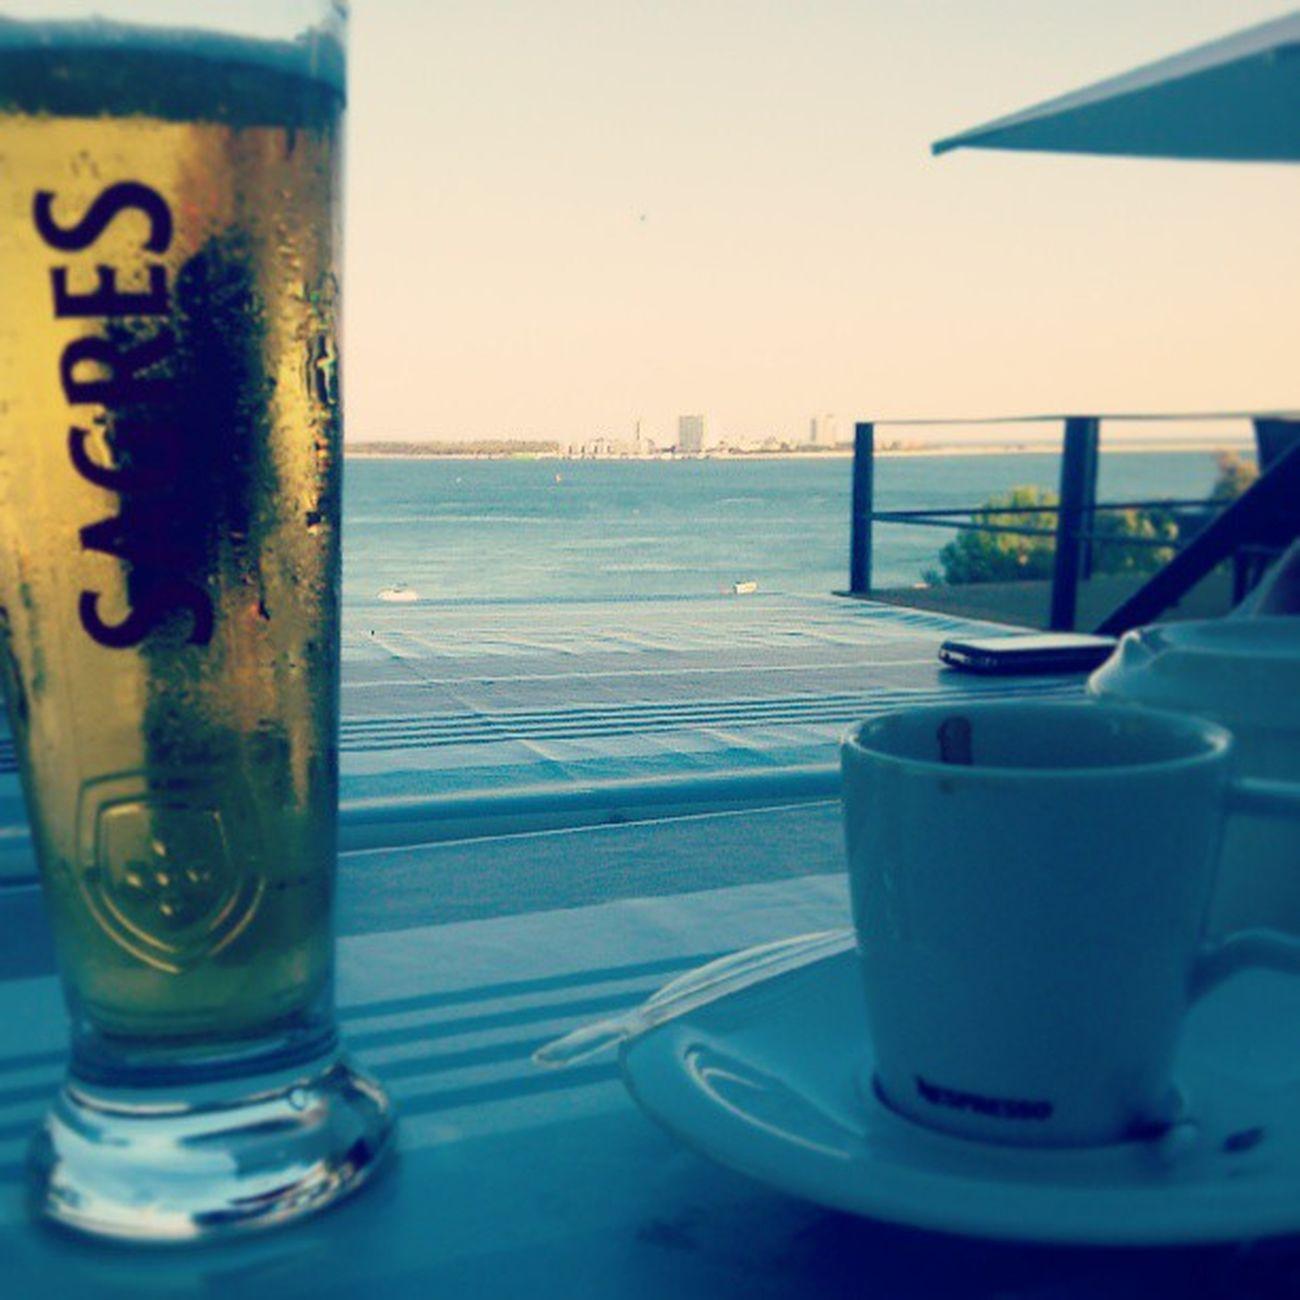 Good life :)